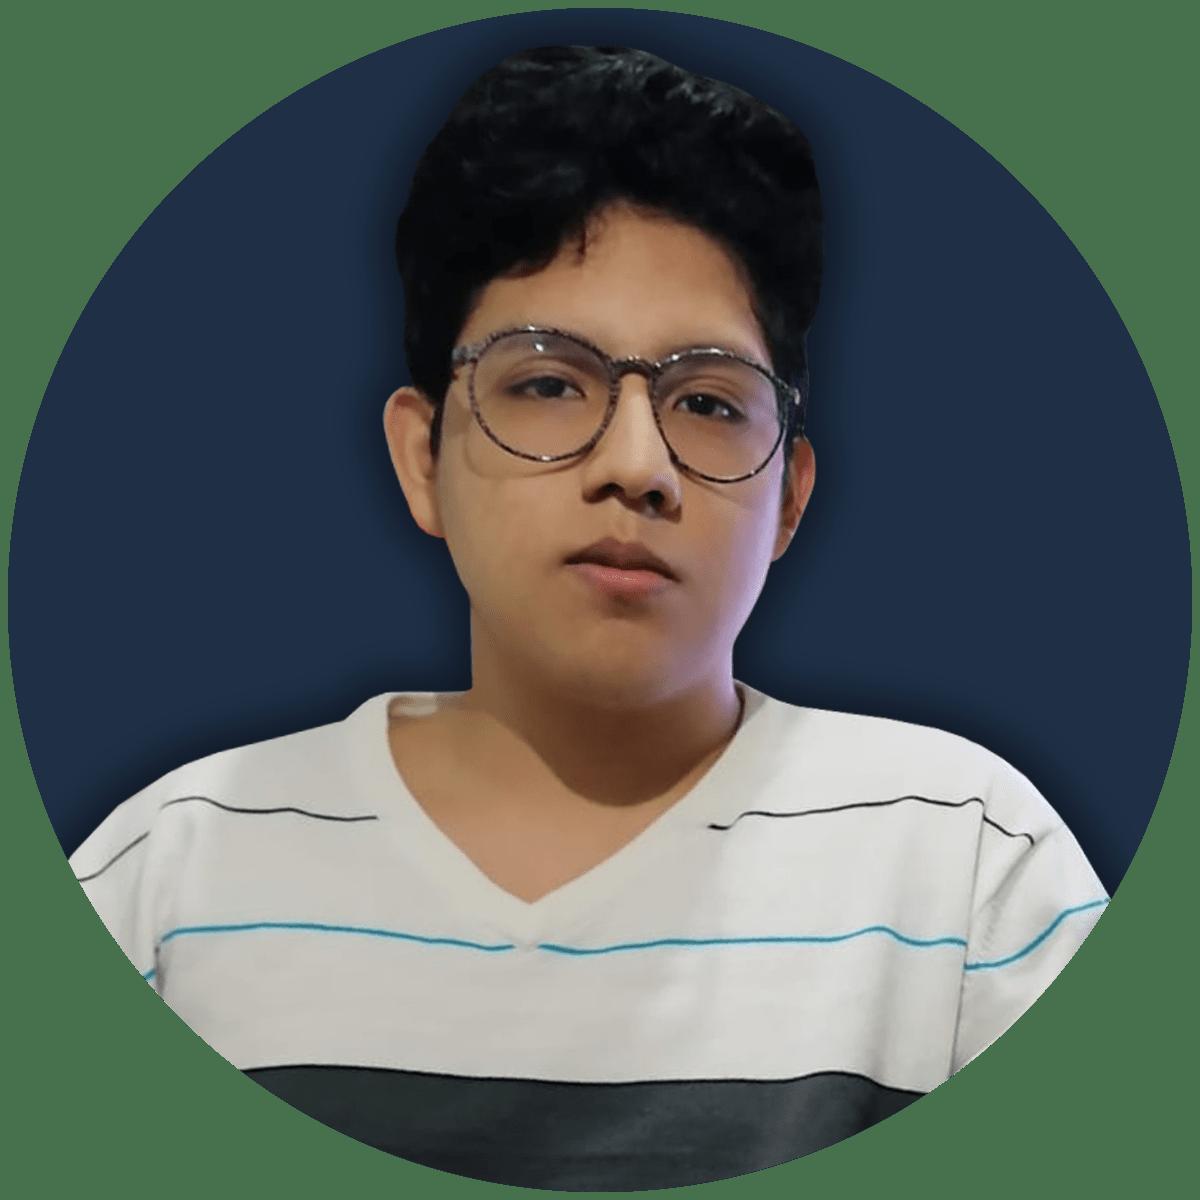 Manuel Ortiz Videojuegos Vision Geek